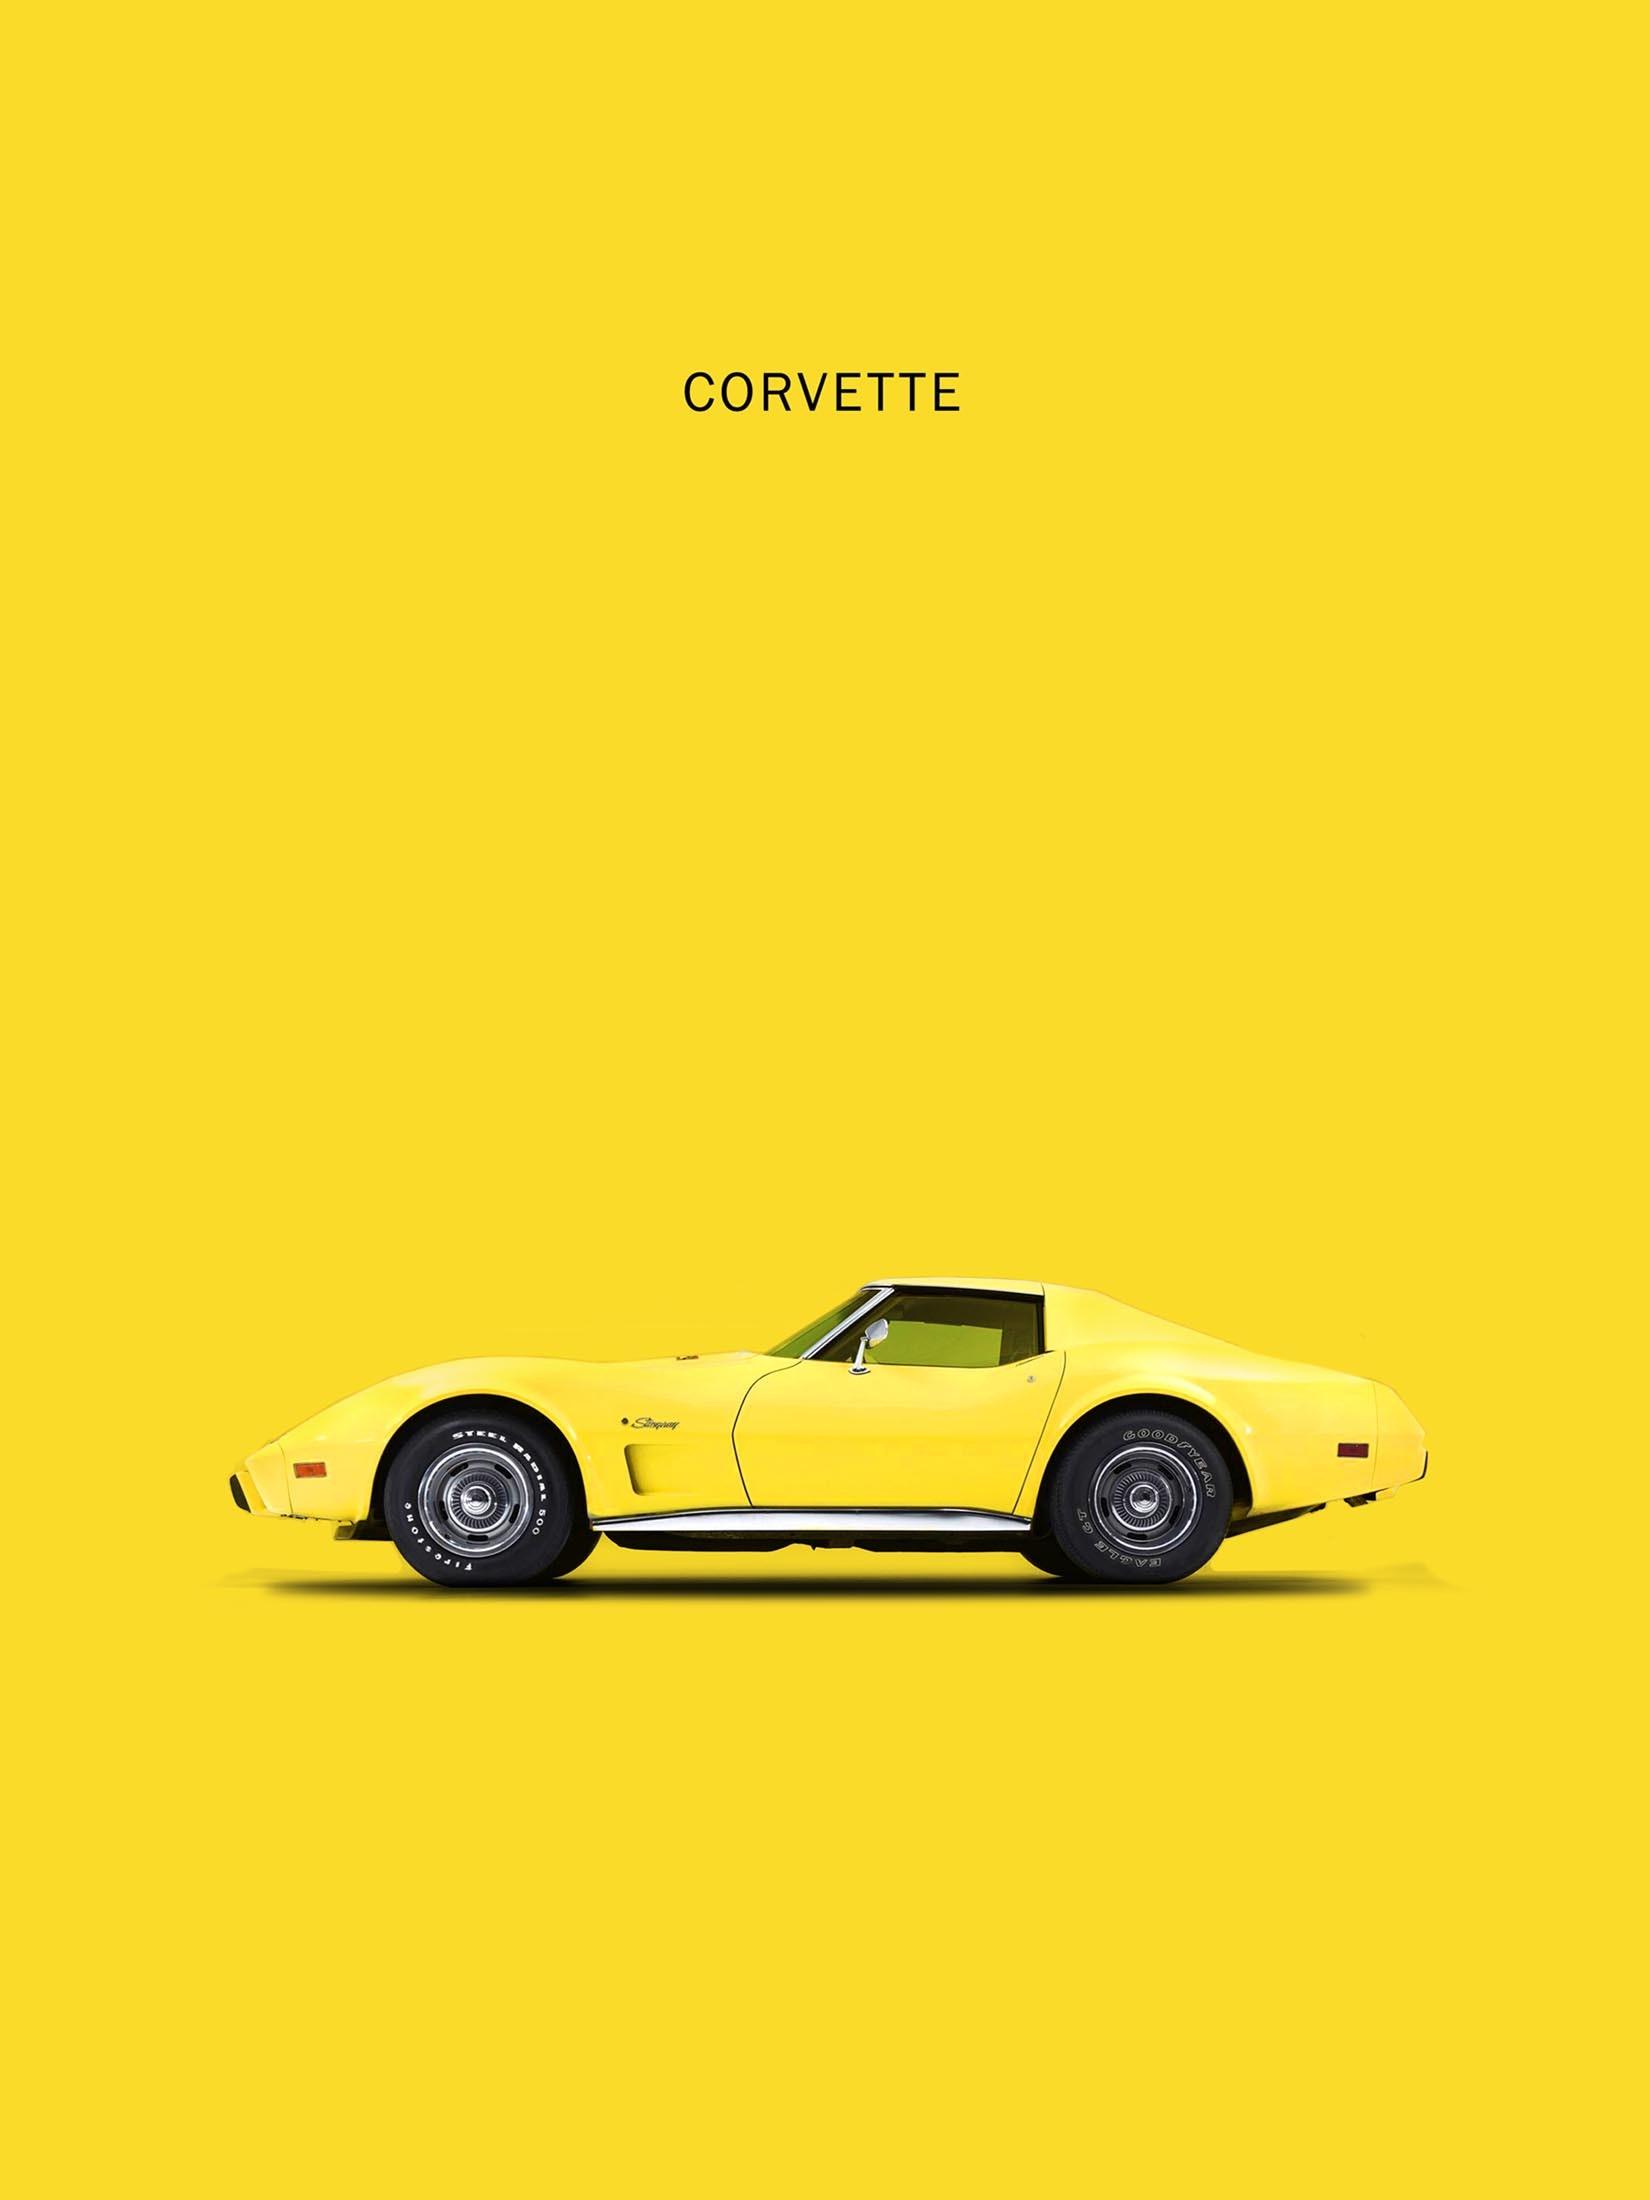 Corvette - Yellow